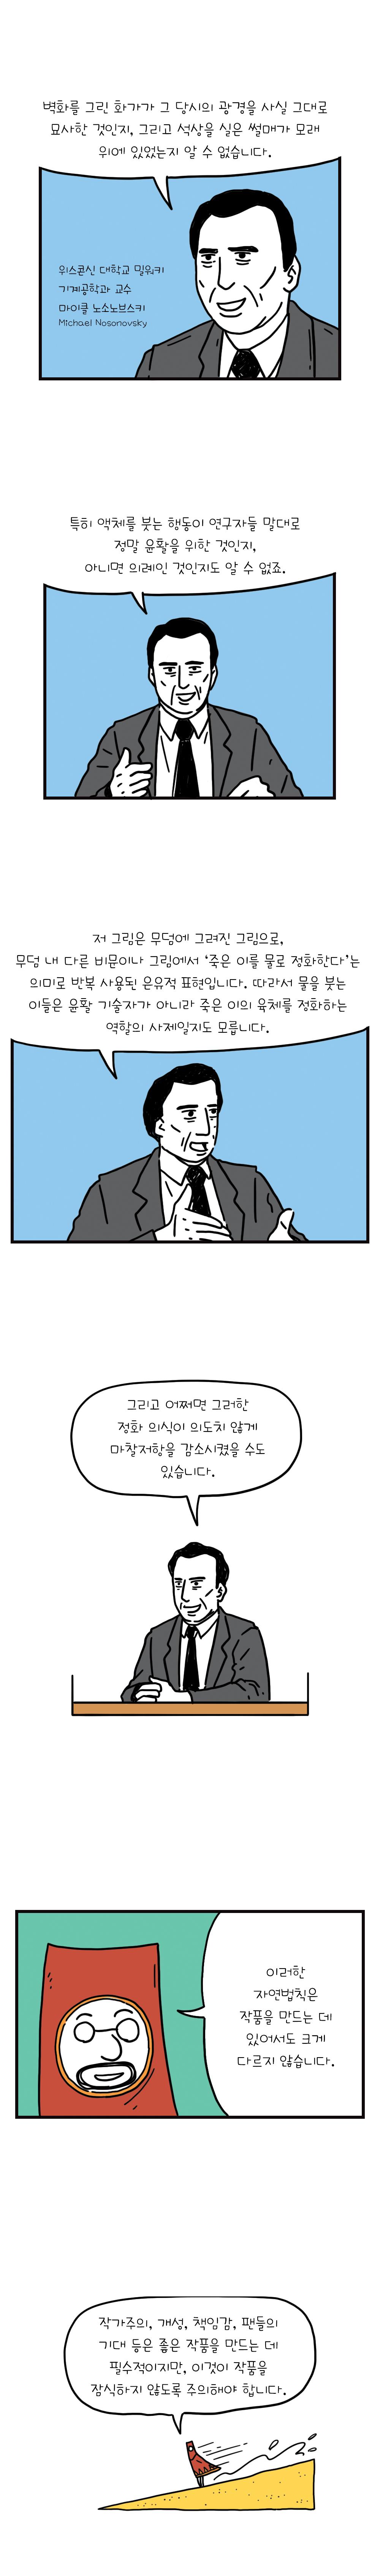 SG_S5_10_Journey_07